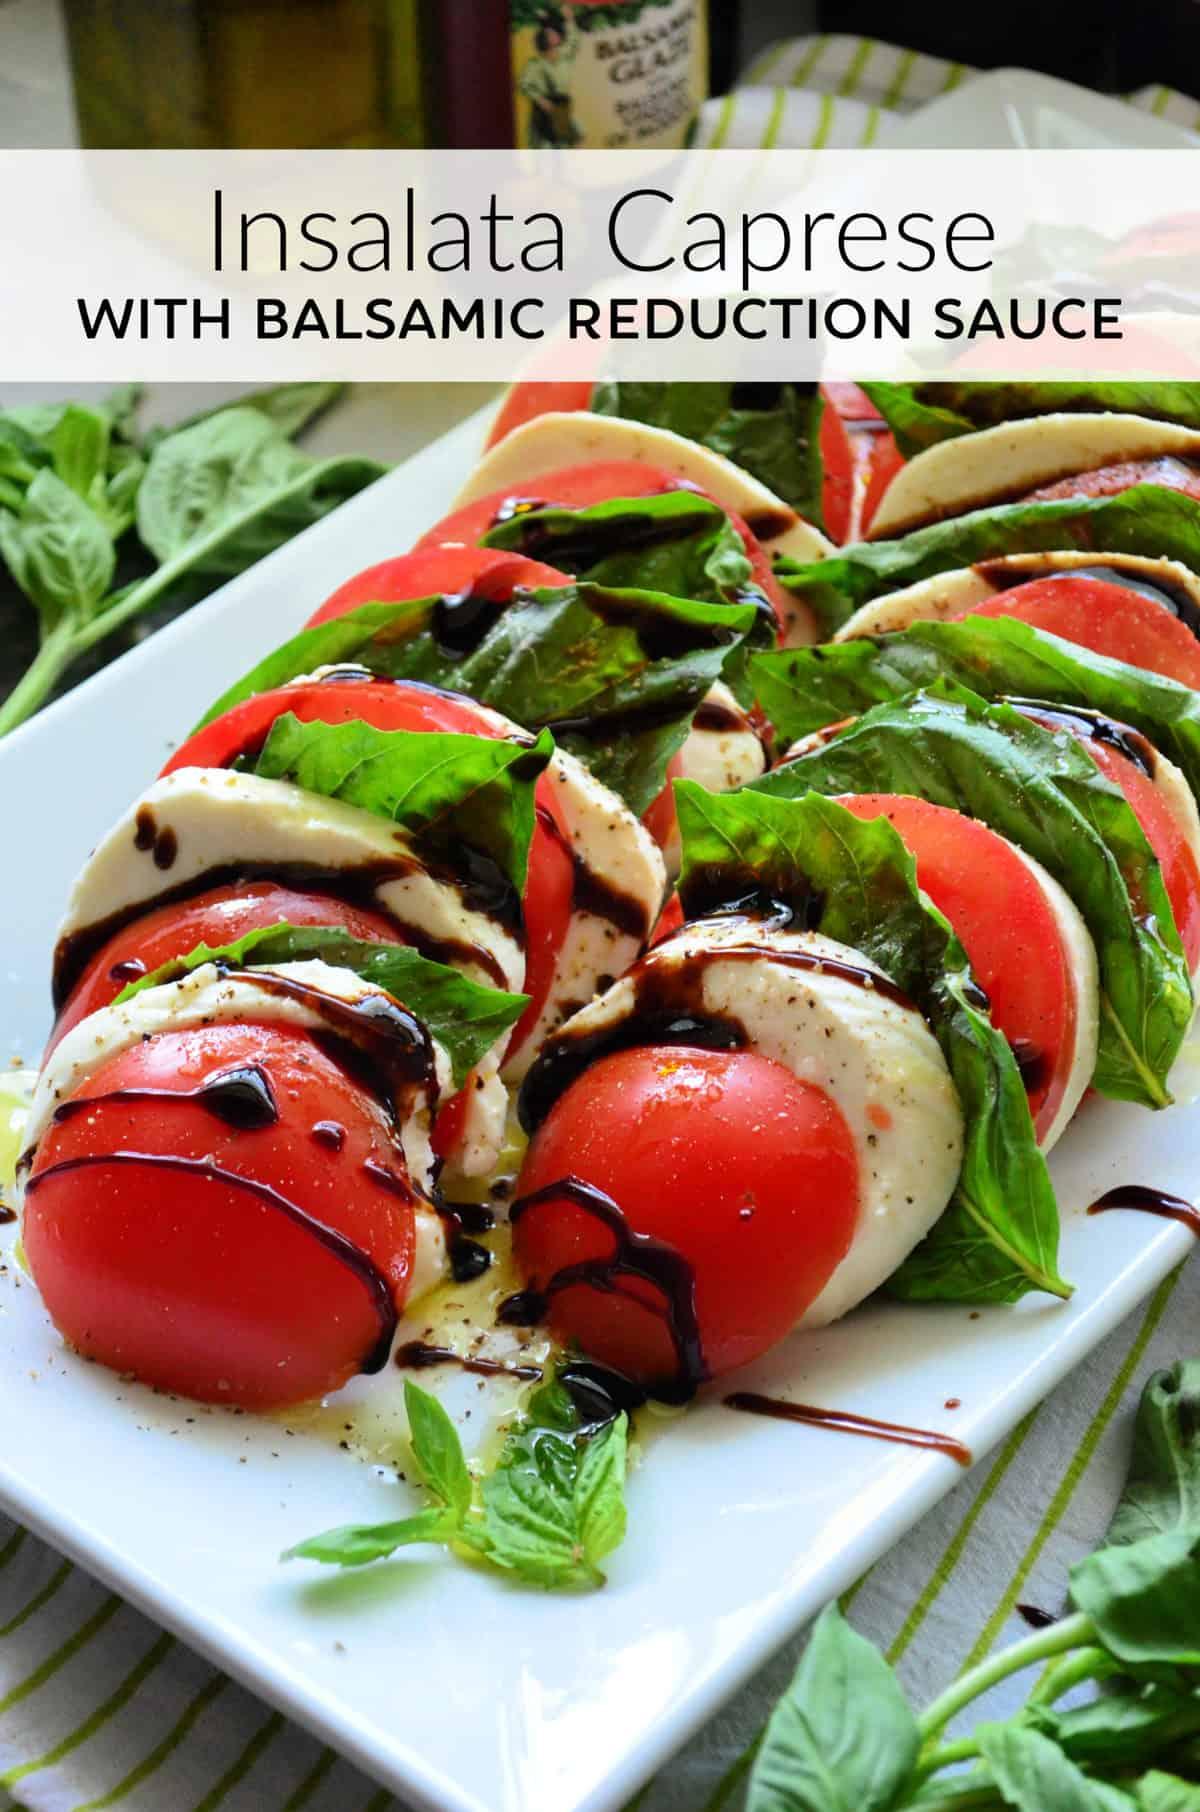 Insalata Caprese with Balsamic Reduction Sauce